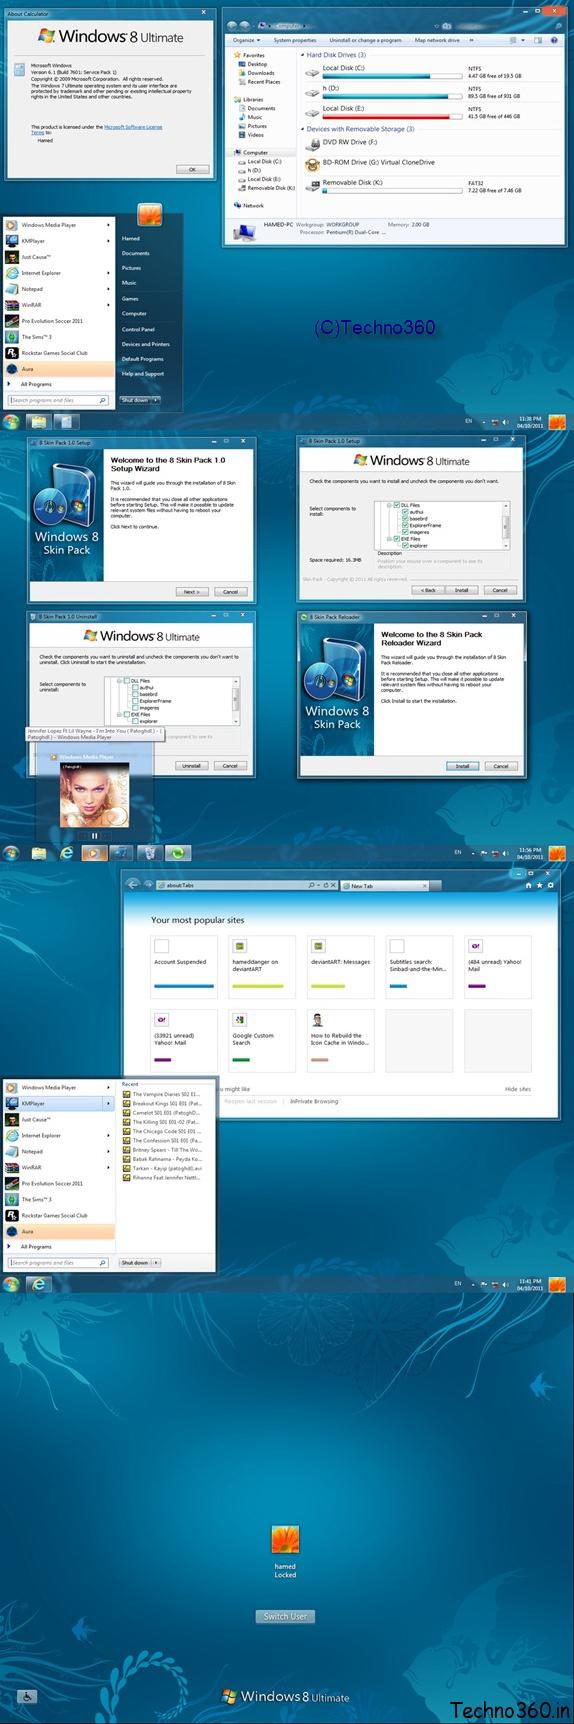 Download Windows 8 Skin Pack